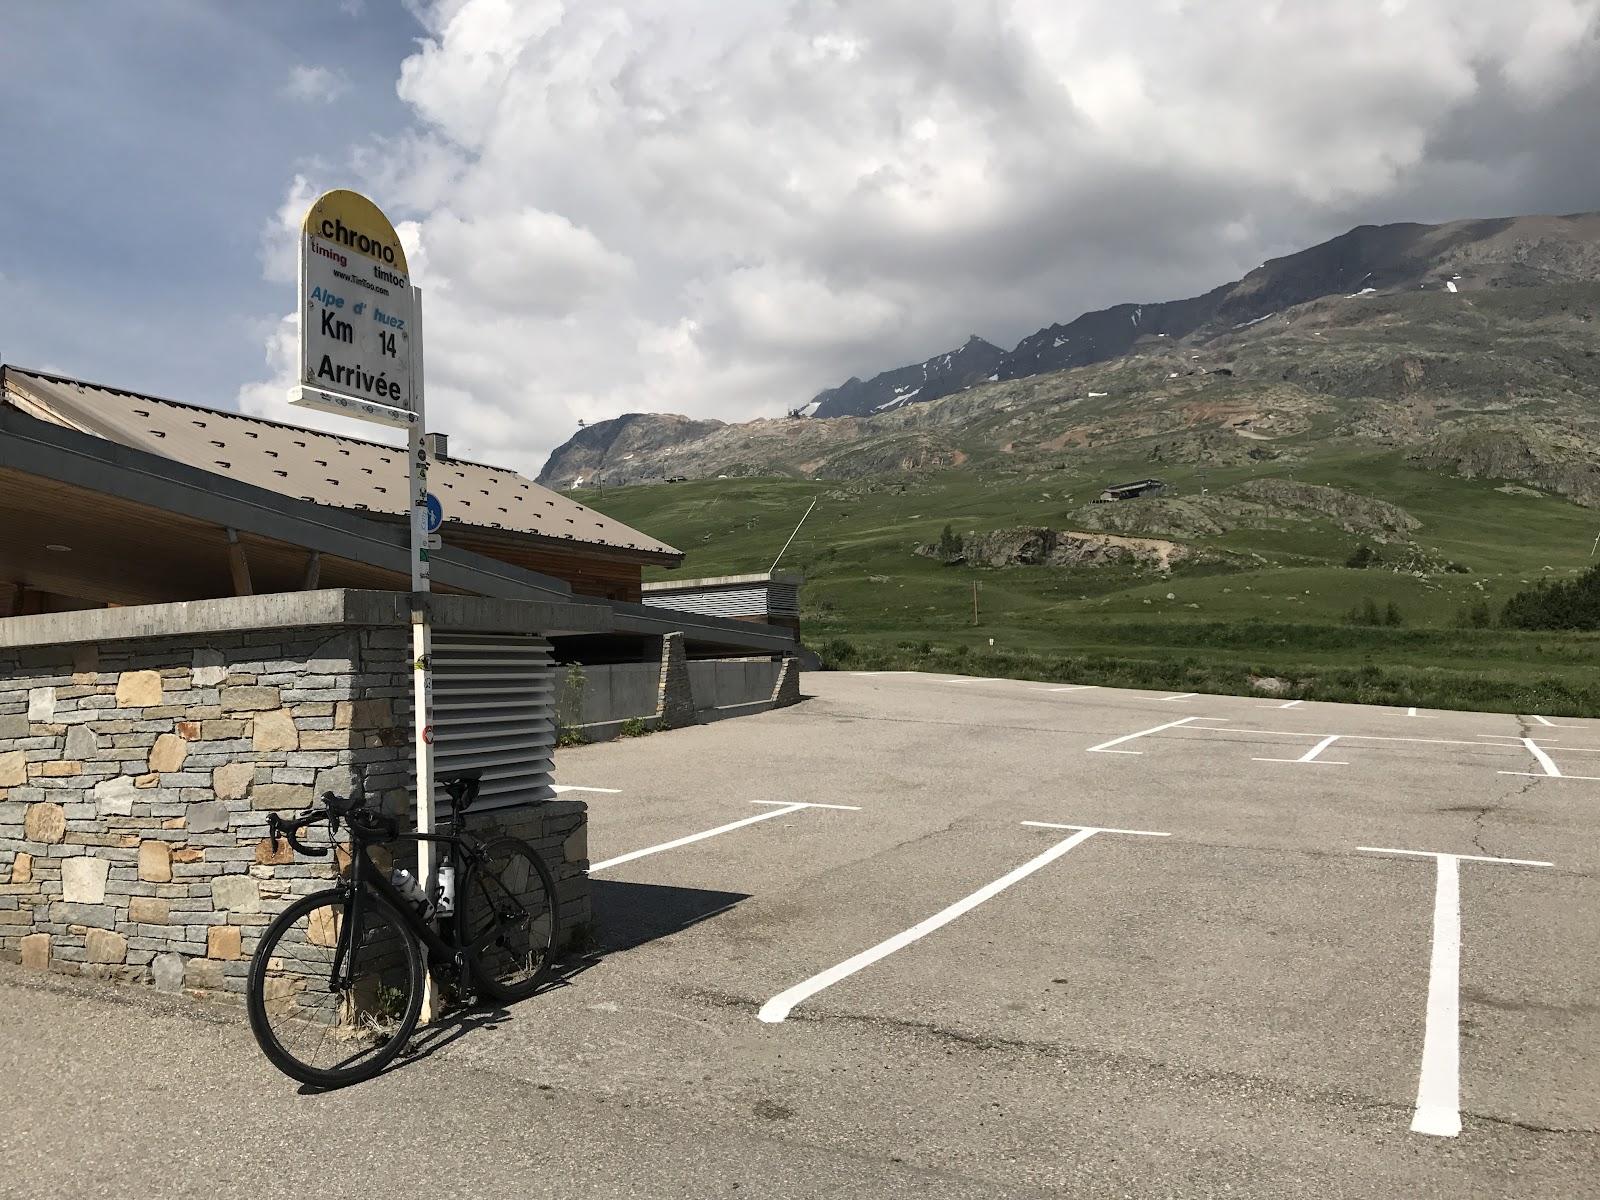 Riding bike up Alpe d'Huez - finish line and bike next to Alpe d'Huez Tour de France sign.